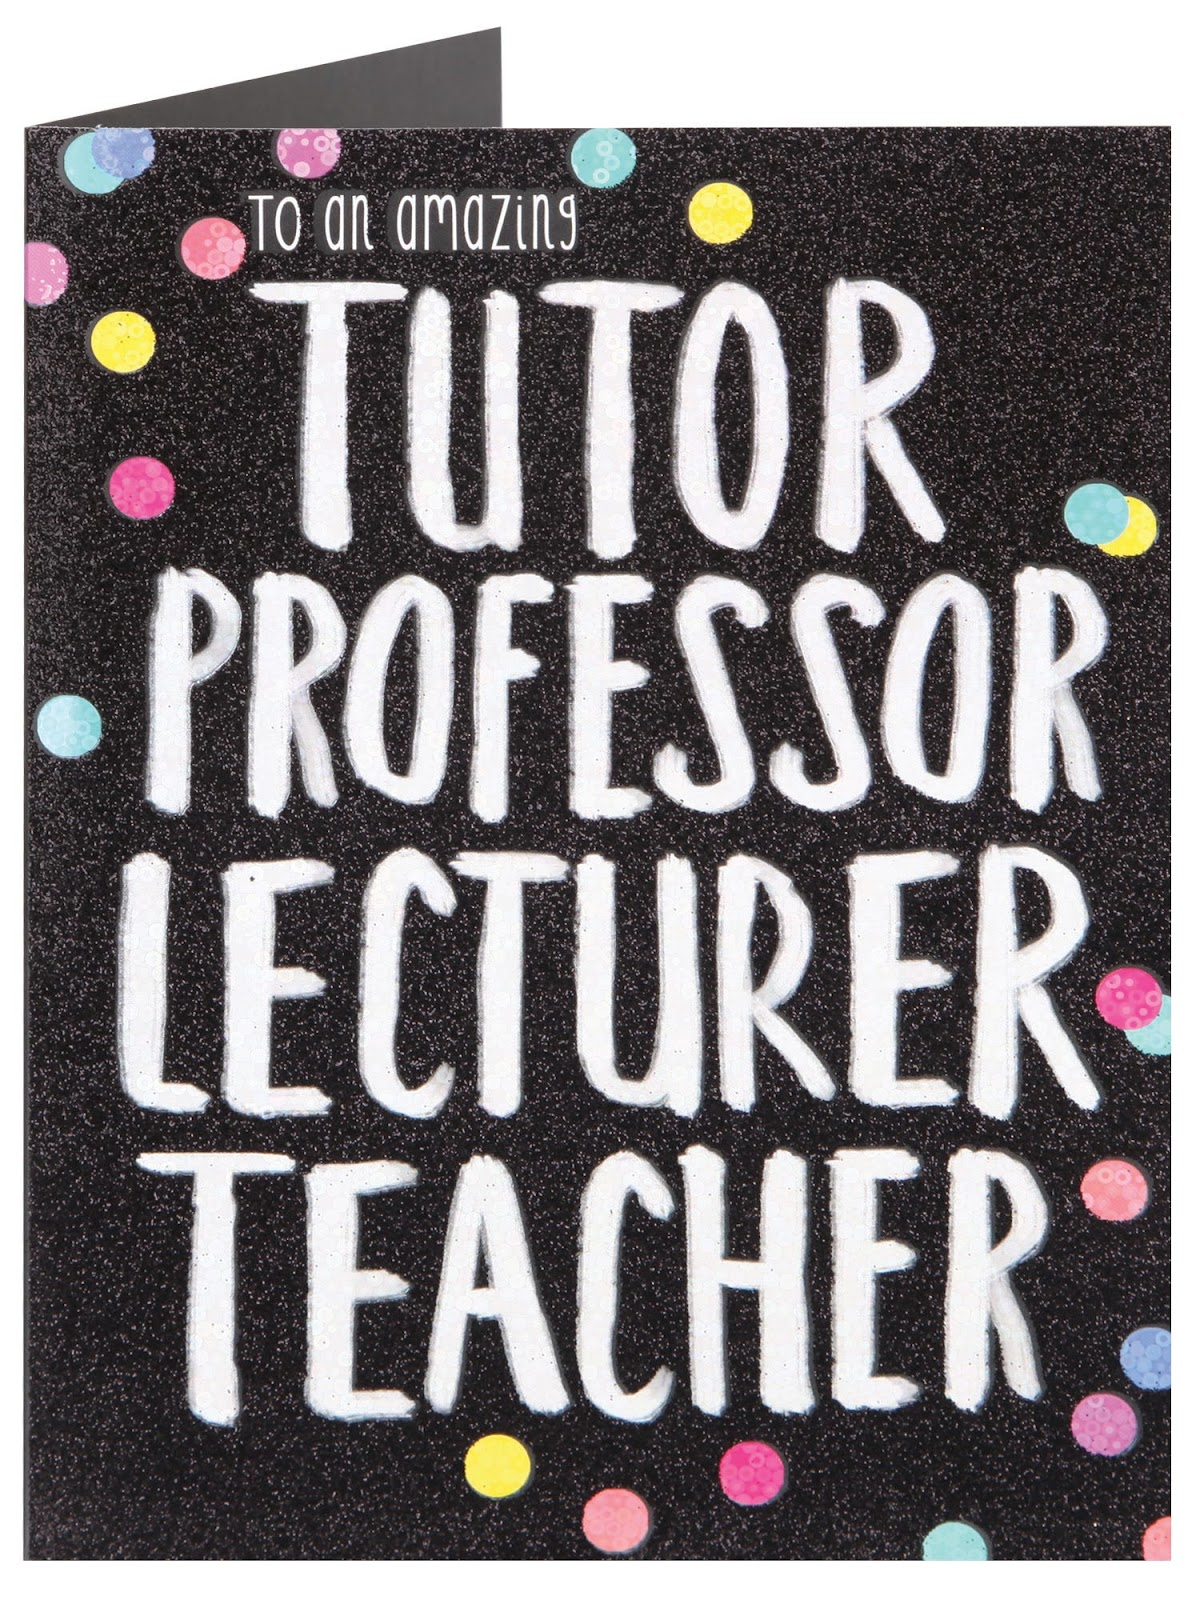 Thank You Gift for Teachers; Amazing Tutor Professor Lecturer Teacher Card